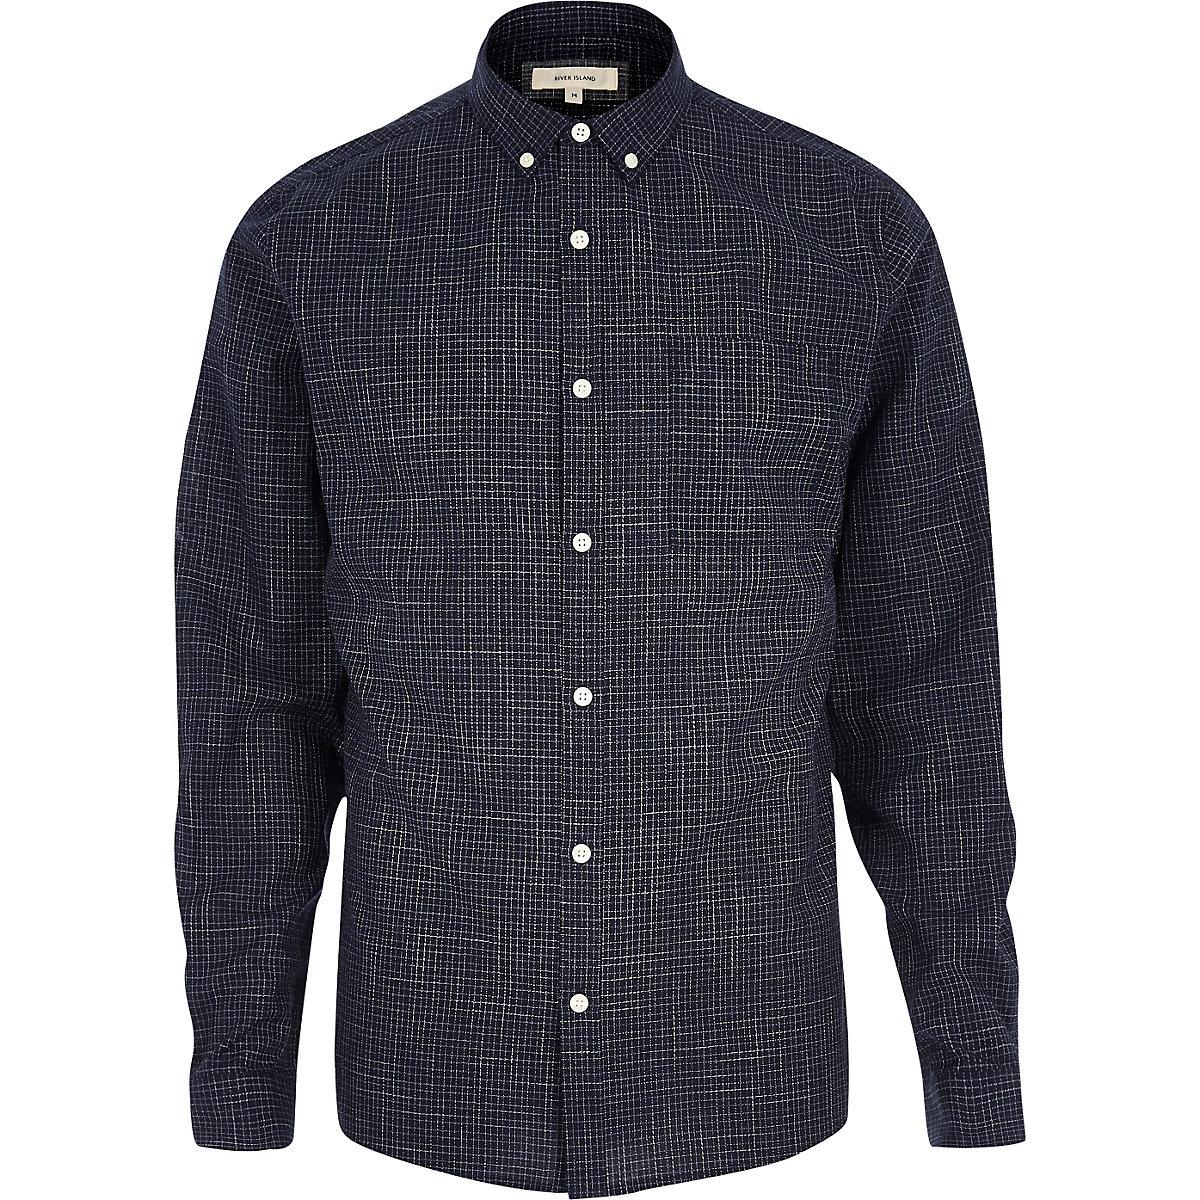 Navy print casual textured shirt